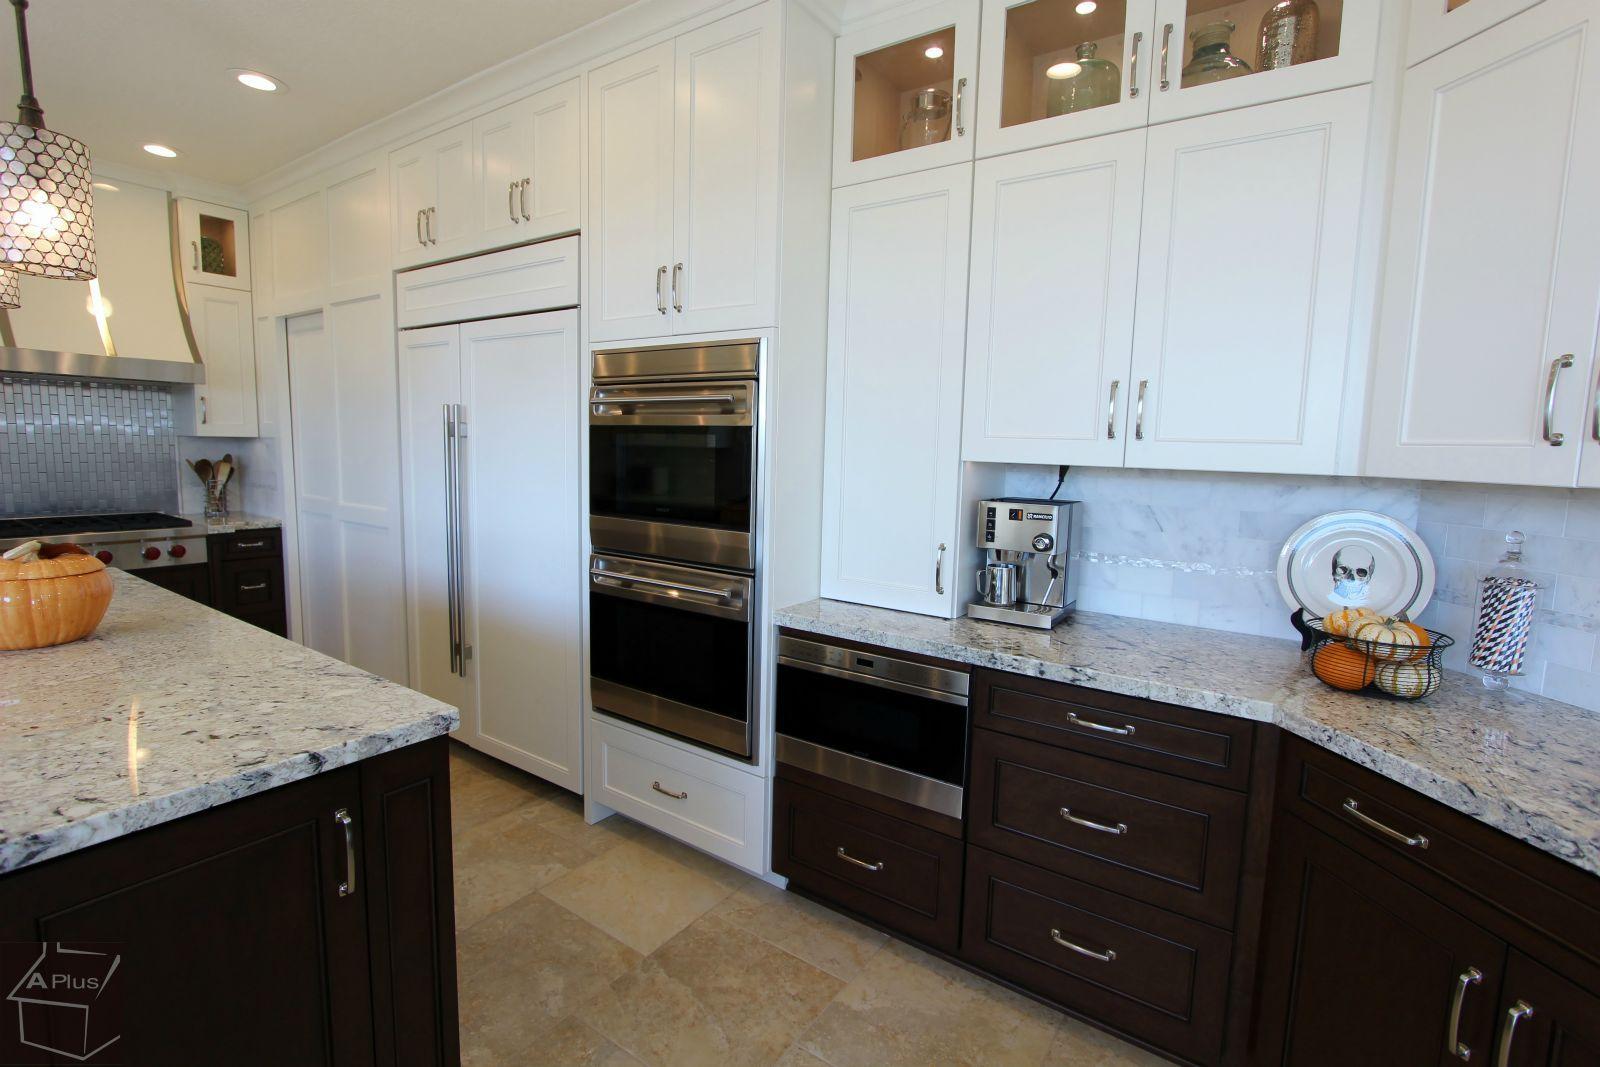 Transitional Kitchen Remodel With Custom Cabinets In Yorba Linda Orange County California Transitional Kitchen Kitchen Remodel Contemporary Style Kitchen